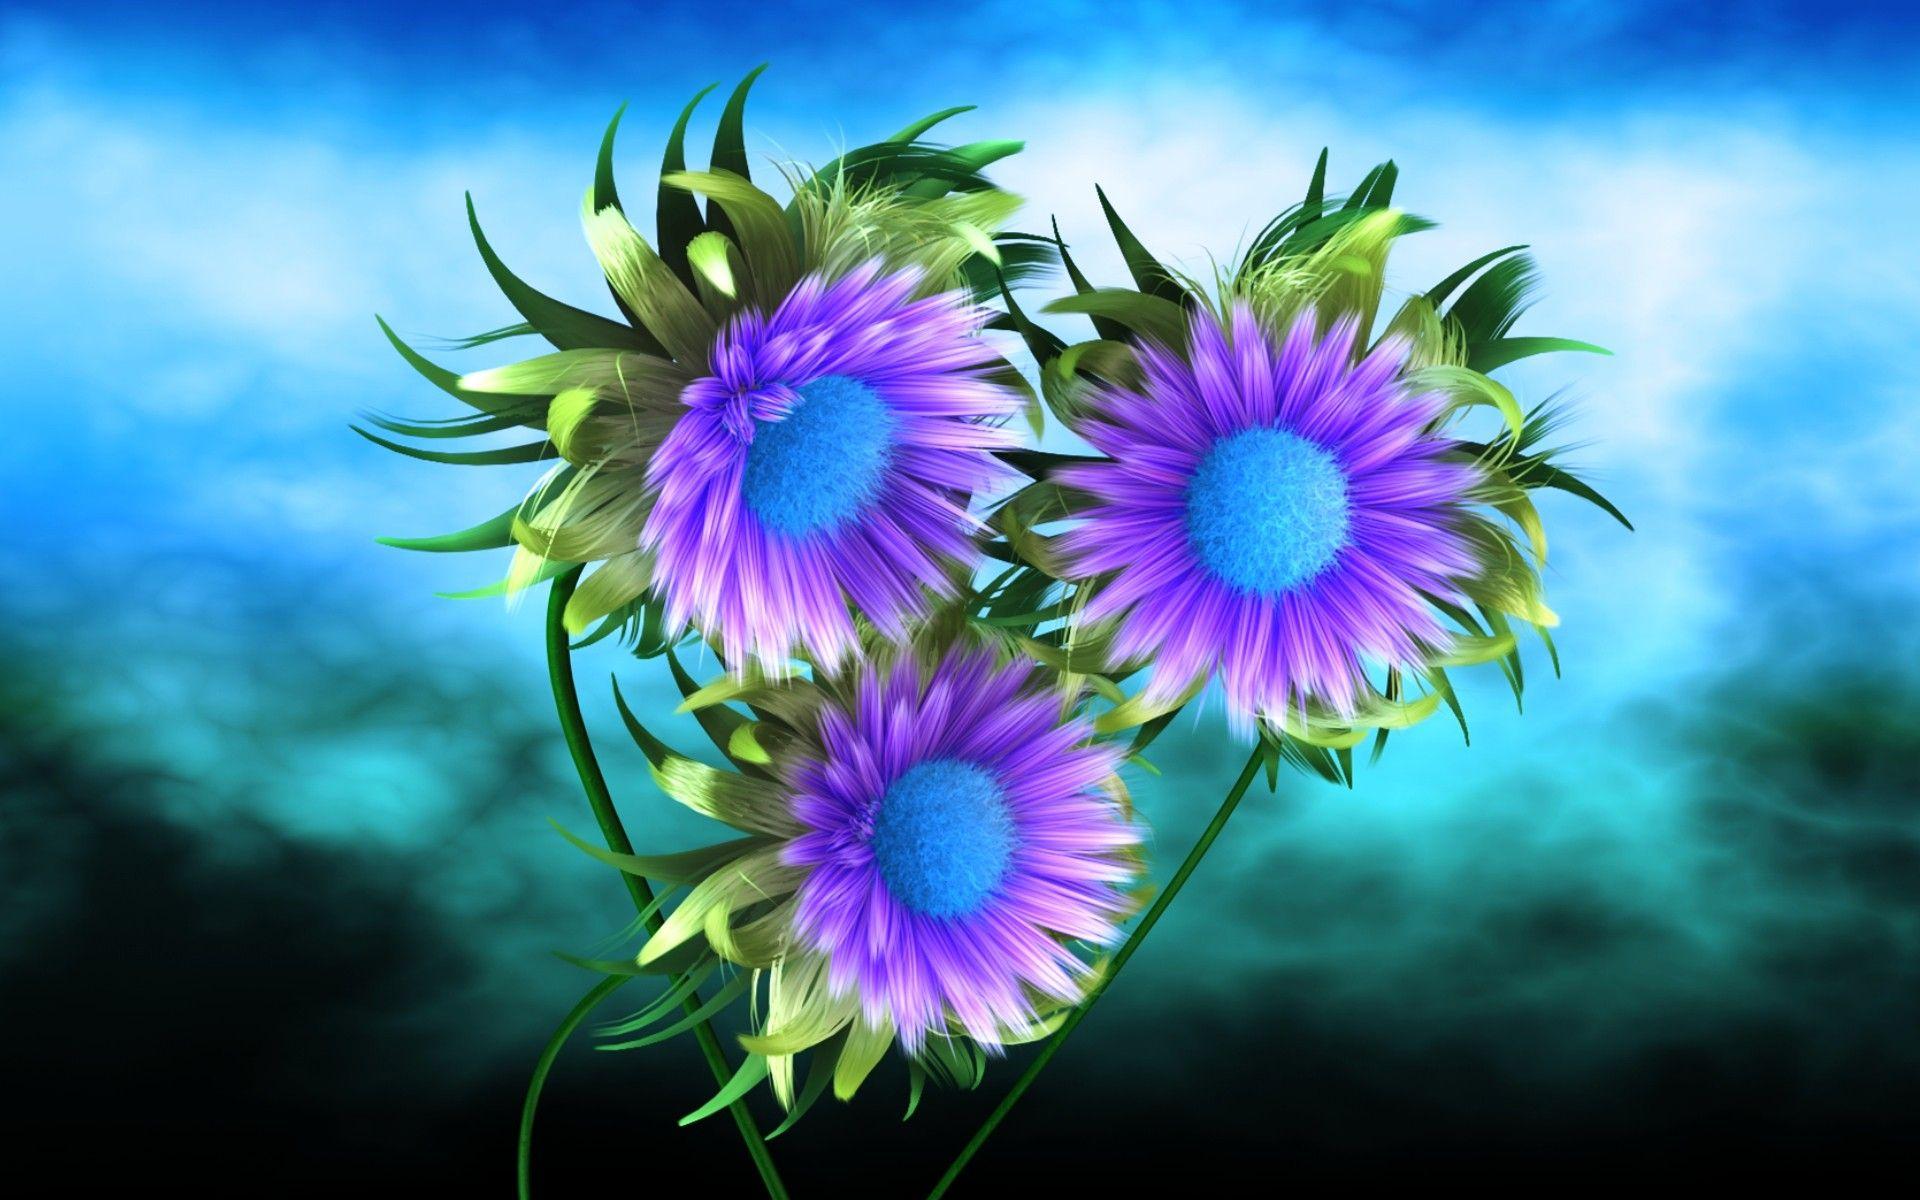 Hd 3d Flower Wallpaper Wallpaper Pinterest Purple Flowers